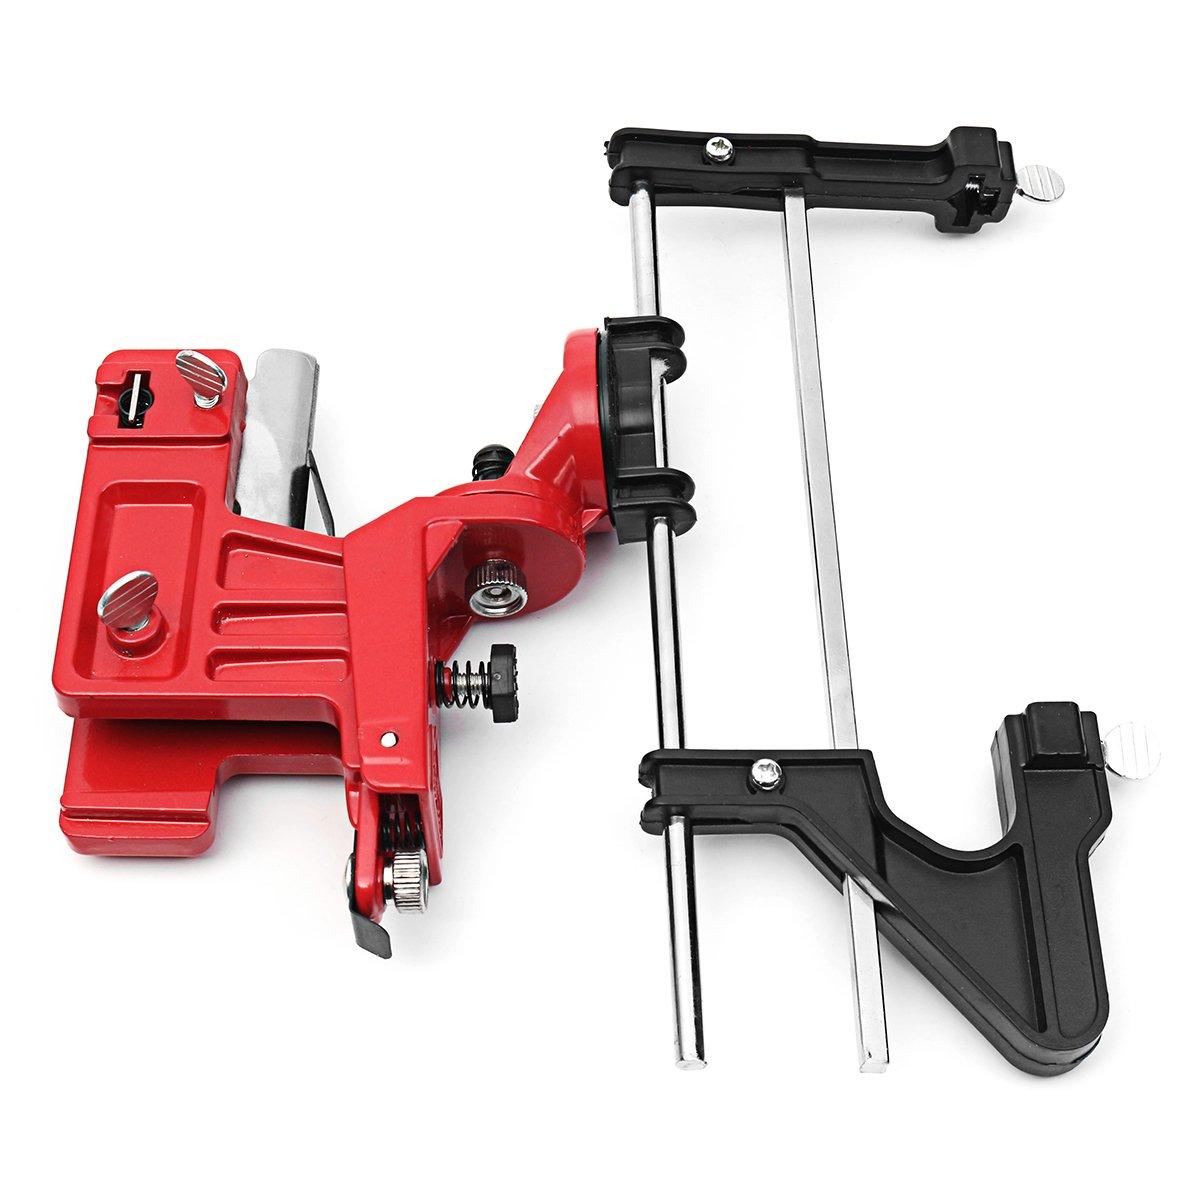 Yingte Manual Chain Saw Sharpener Grinder Bar Mounted Filing Clamp Tools Kit